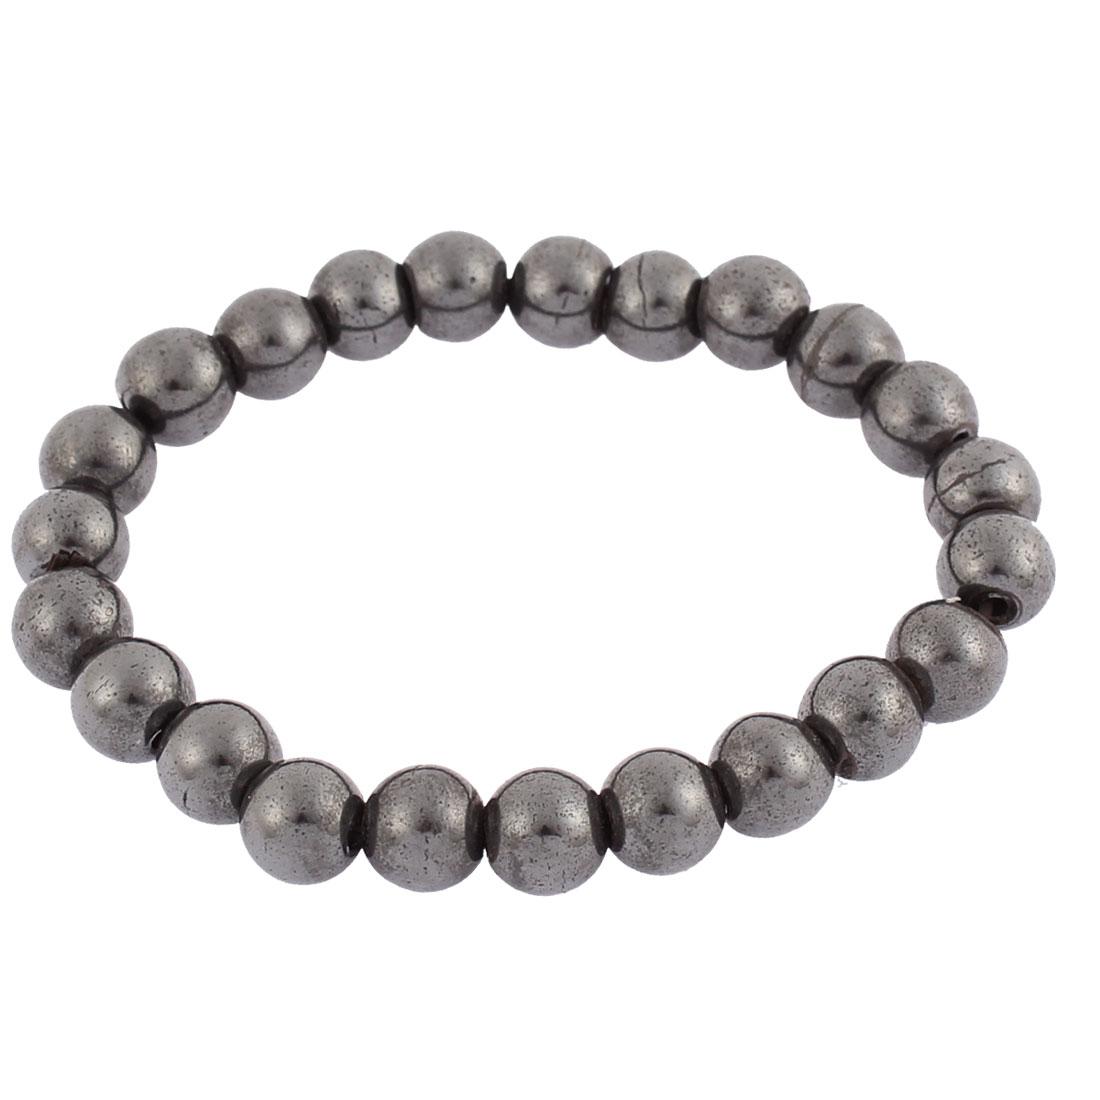 Women Men Round Hematite Beads Elastic Wrist Magnetic Bracelet Bangle Dark Grey